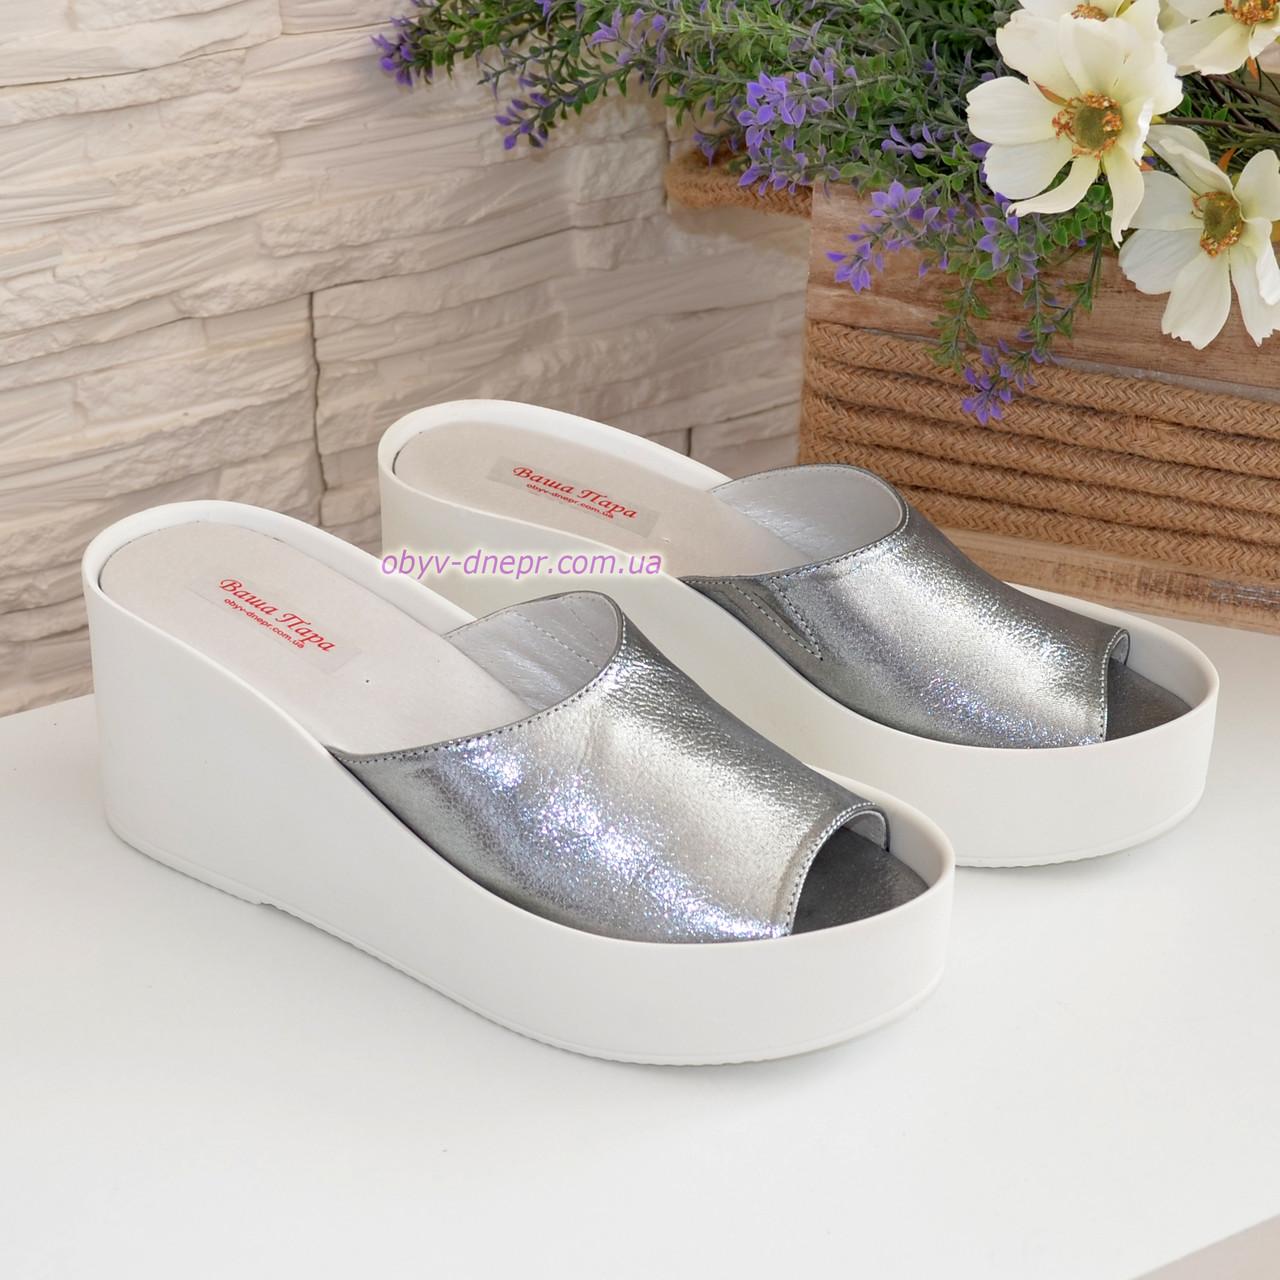 fe239a4cb25e Шлепанцы кожаные женские на платформе, цвет серебро: продажа, цена в  Днепре. ...